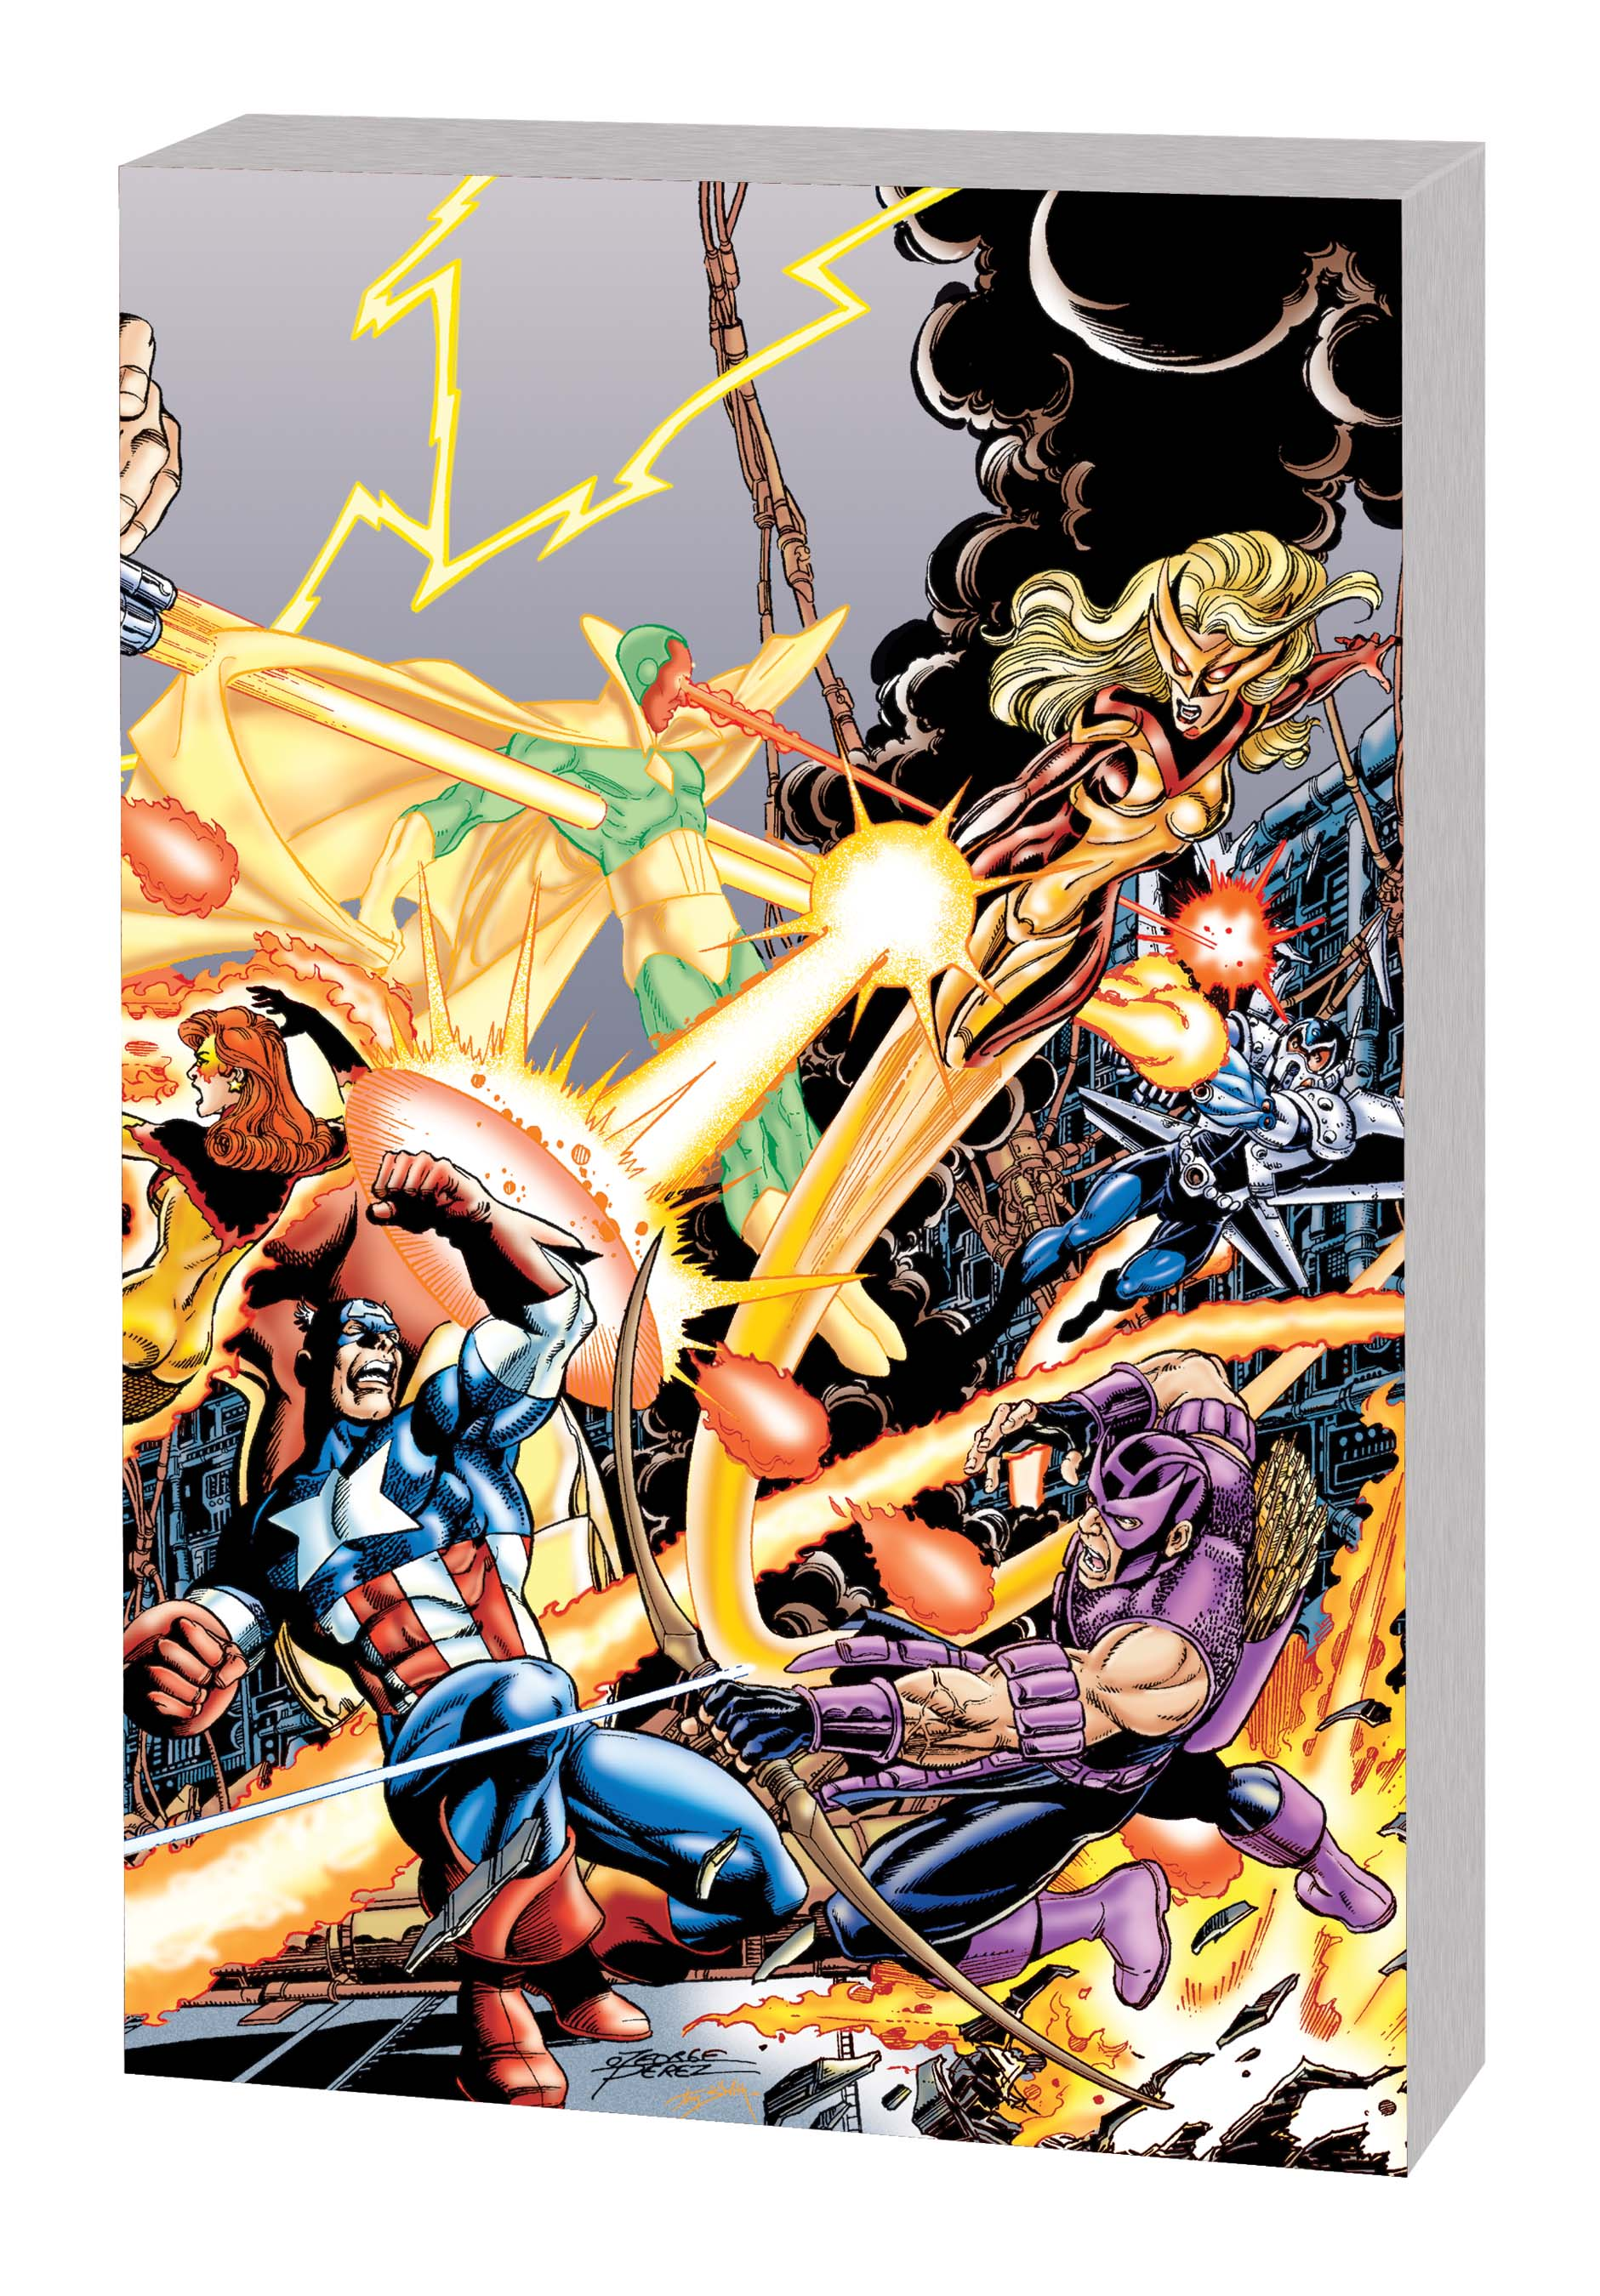 Avengers Assemble Vol. 2 (Trade Paperback)